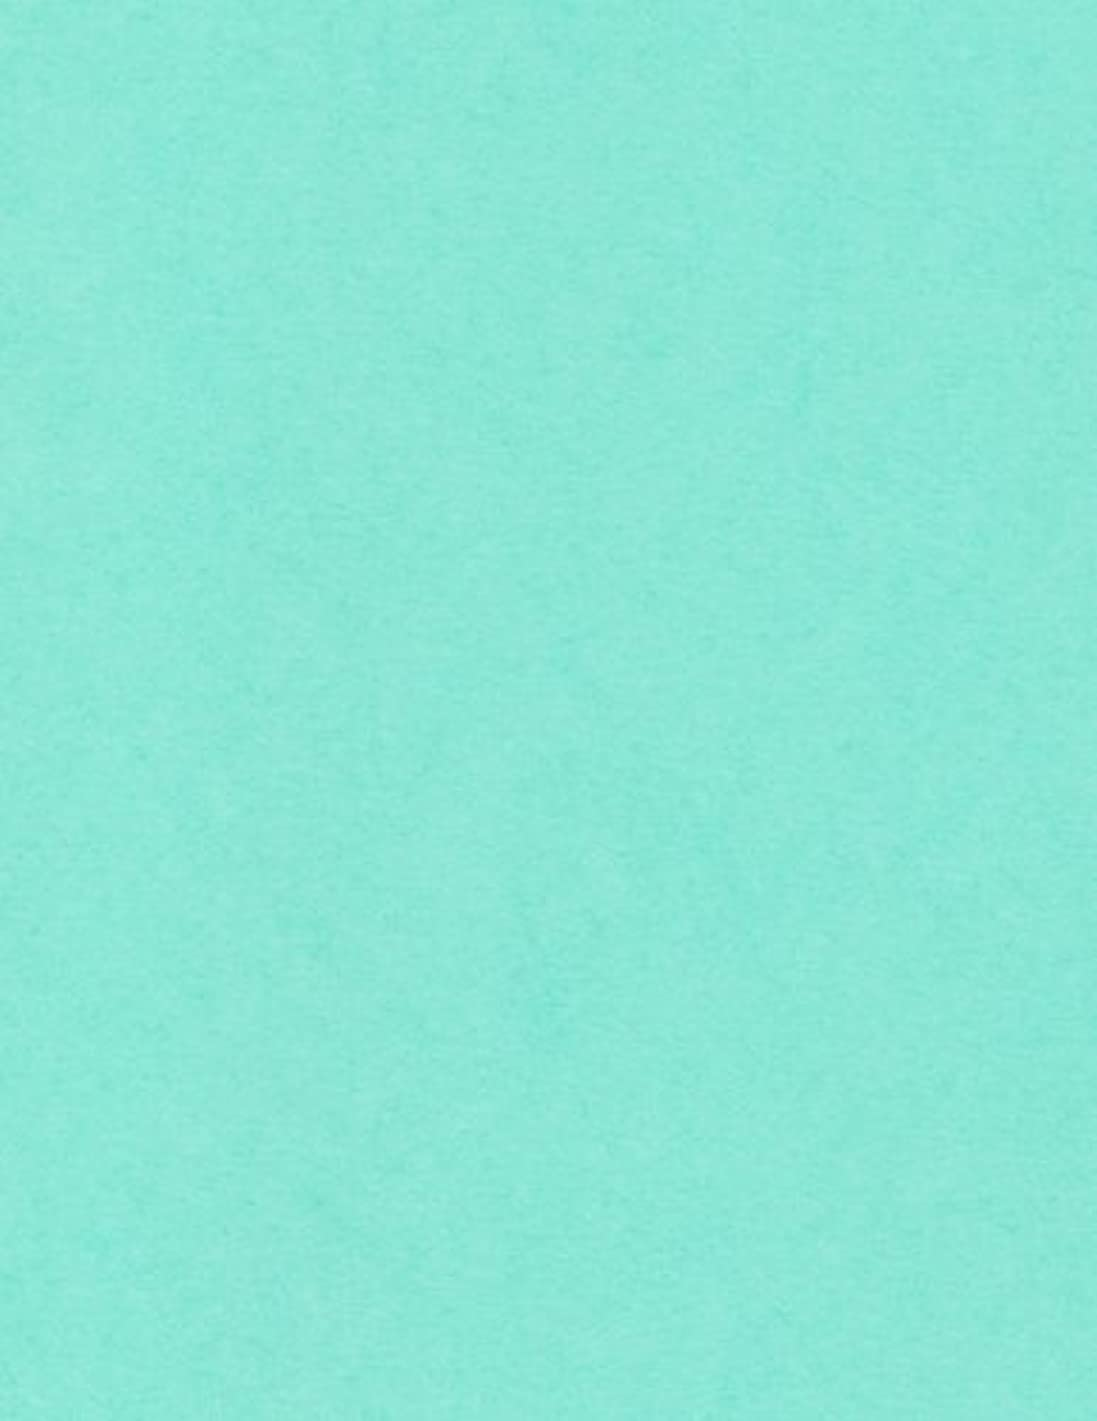 Blu Raspberry Matte Cardstock, 8 1/2 x 11 Poptone 100lb Cover, 250 pack